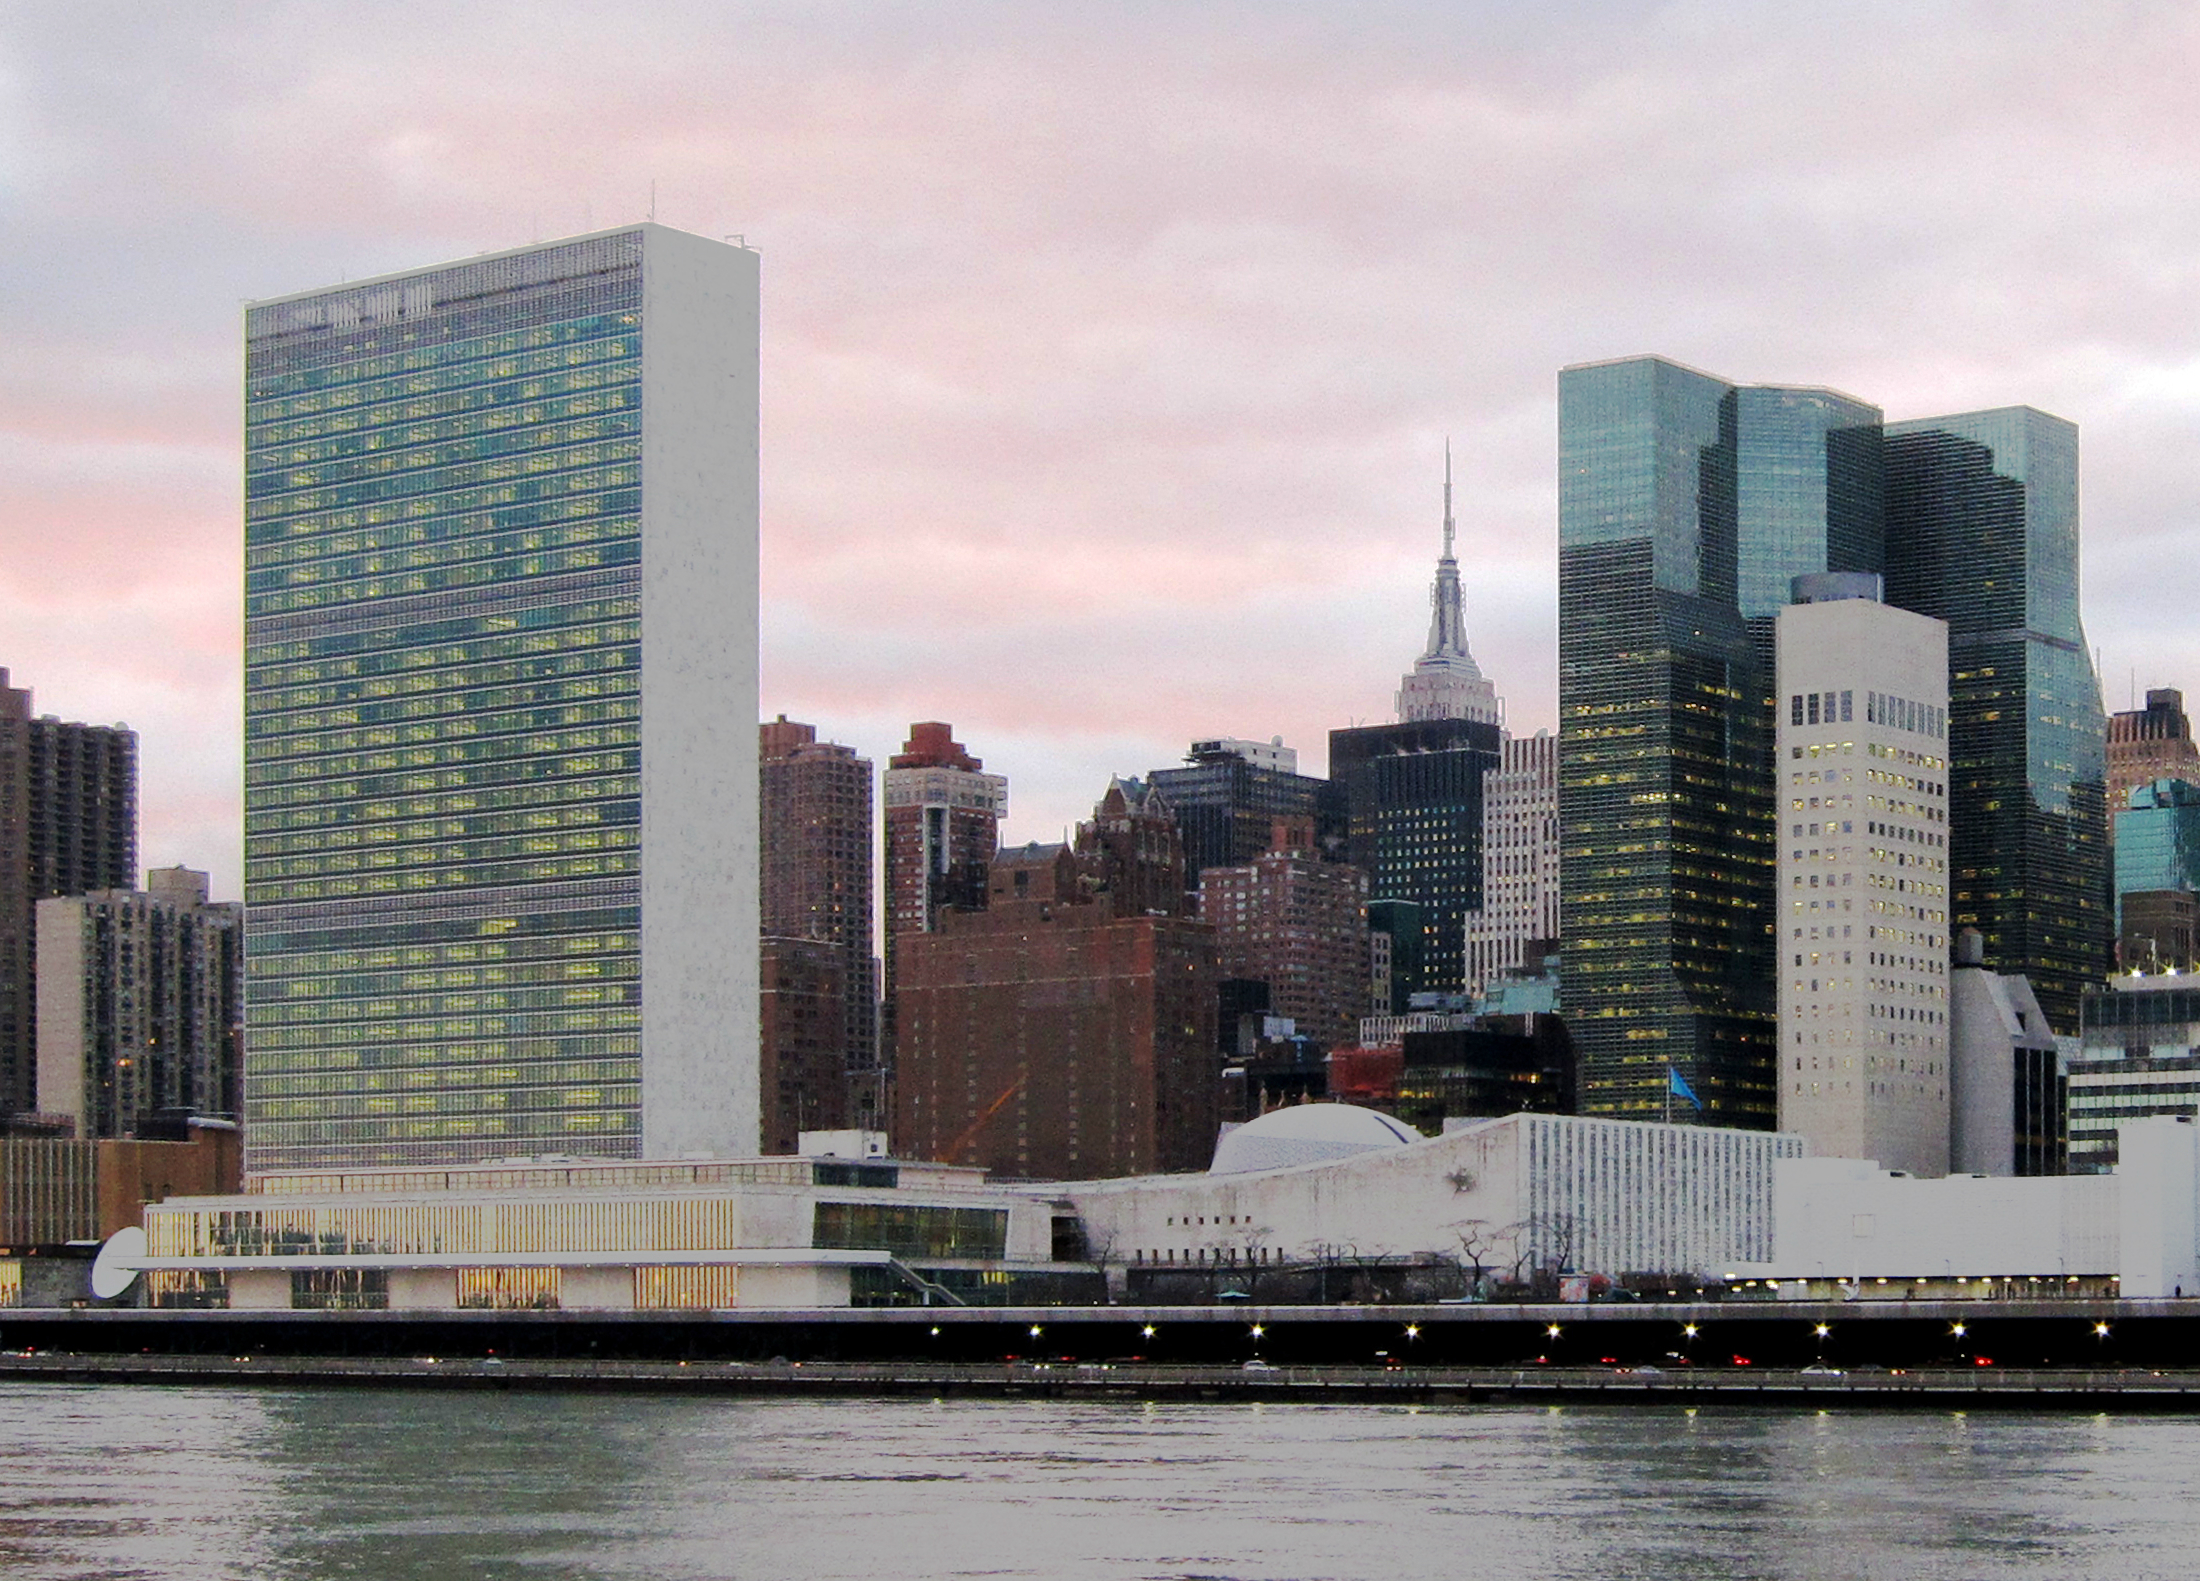 Siège de l'ONU à New-York (Etats-Unis) WIKIMEDIA COMMONS - Neptuul